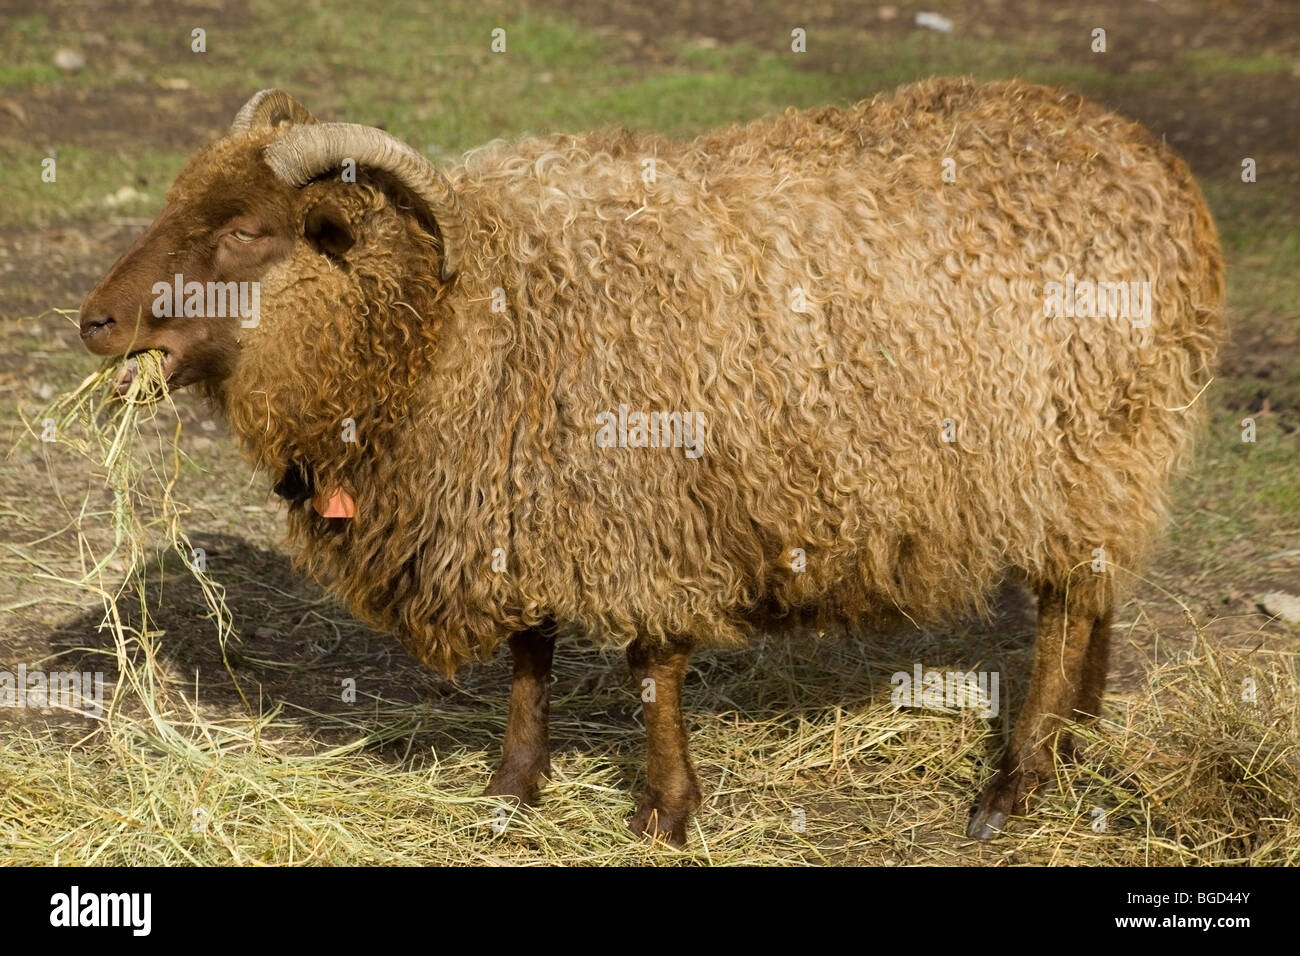 Icelandic sheep, reddish ram, chewing hay at an organic farm Stock Photo